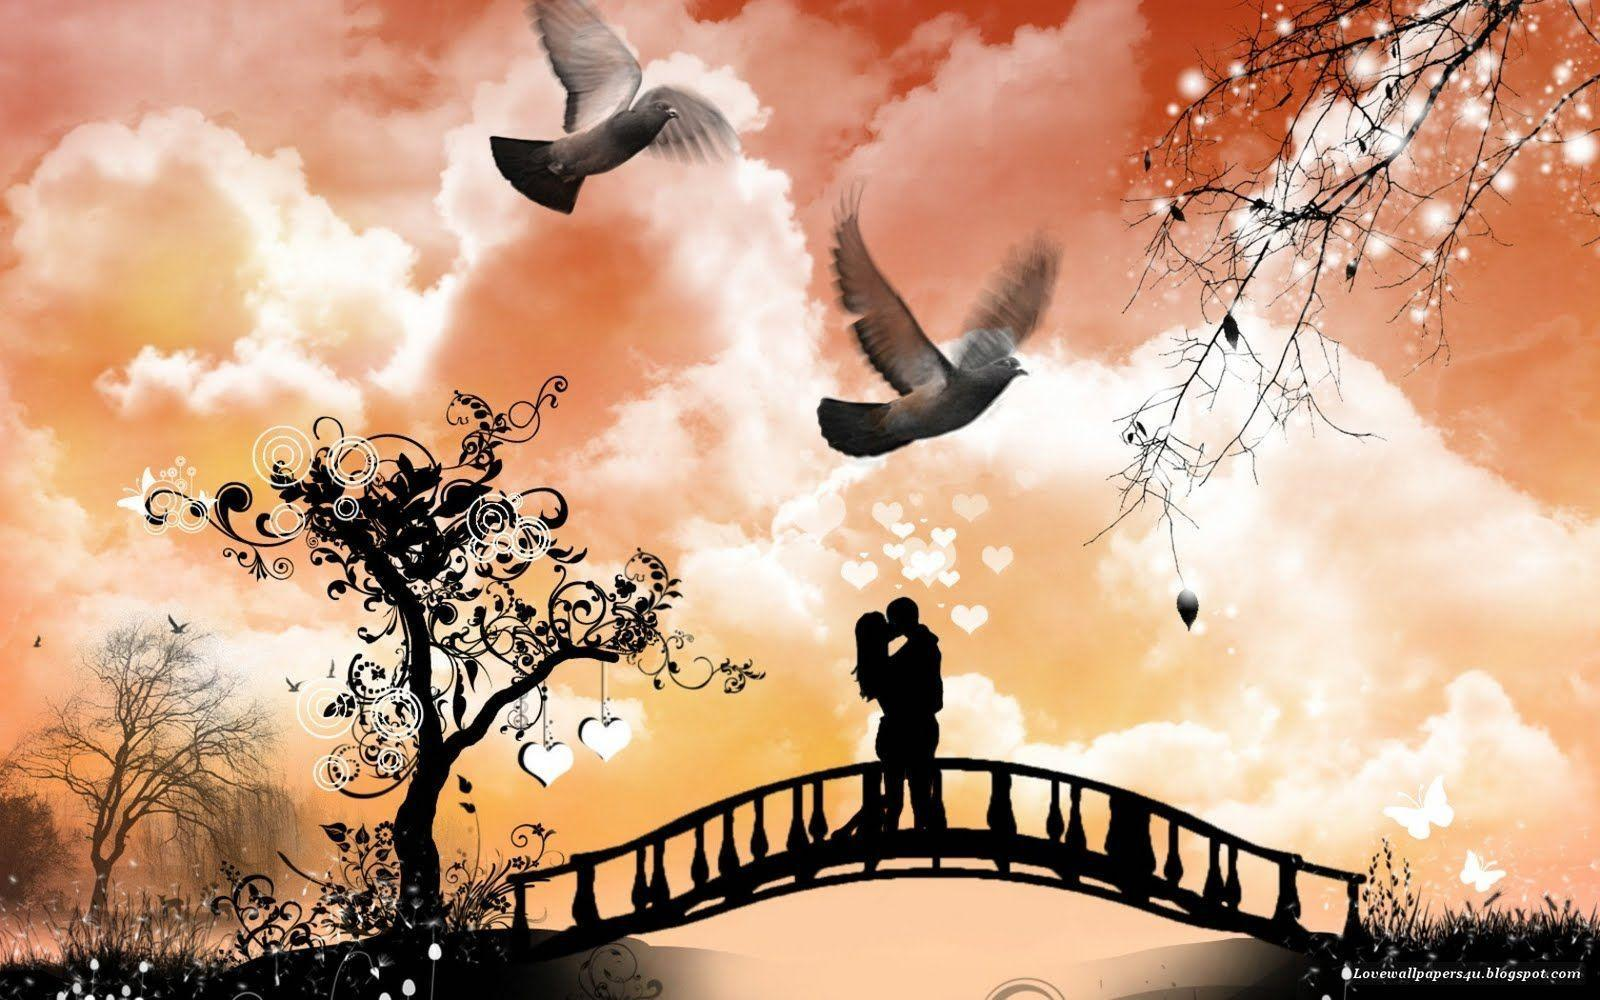 Wallpaper download love hd - Couple Love Hd Wallpapers Free Art Wallpapers